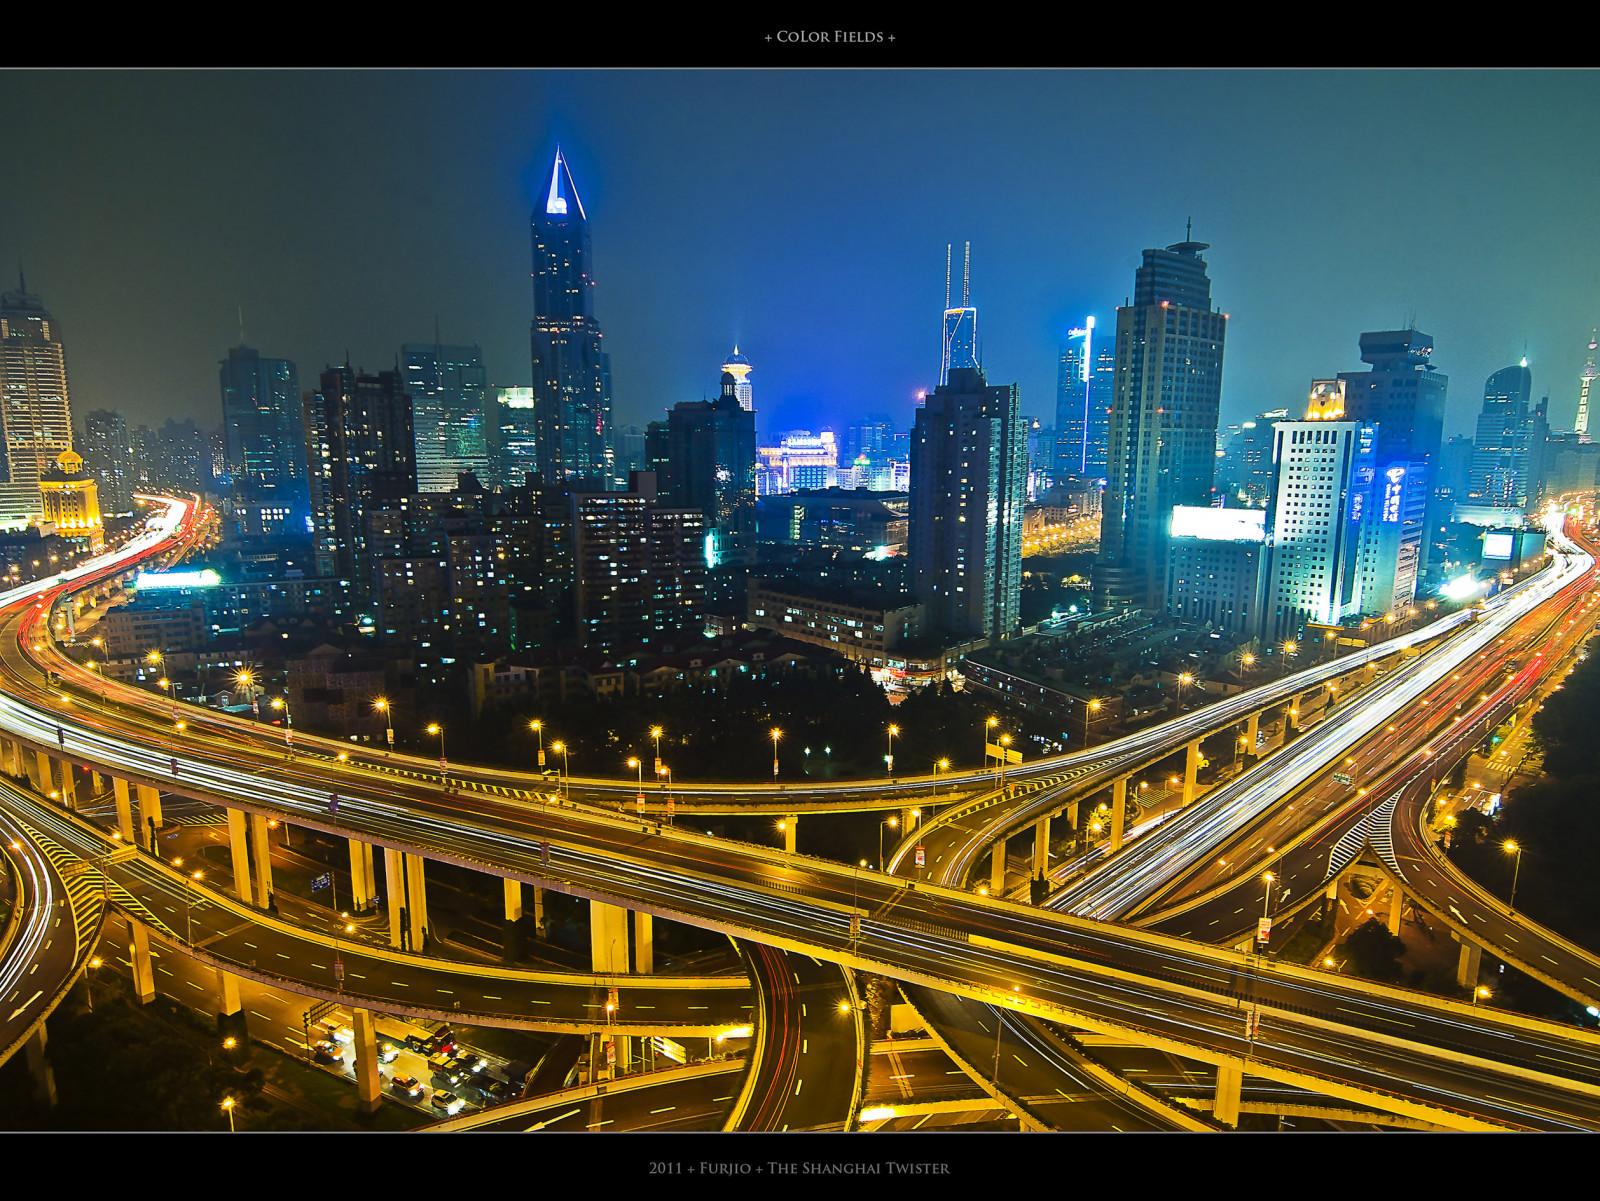 Wallpaper City Color Field Skyline Night Lights Highway Long Exposure Shanghai Intersection Roads Streaks Twister 2516x1890 979222 Hd Wallpapers Wallhere